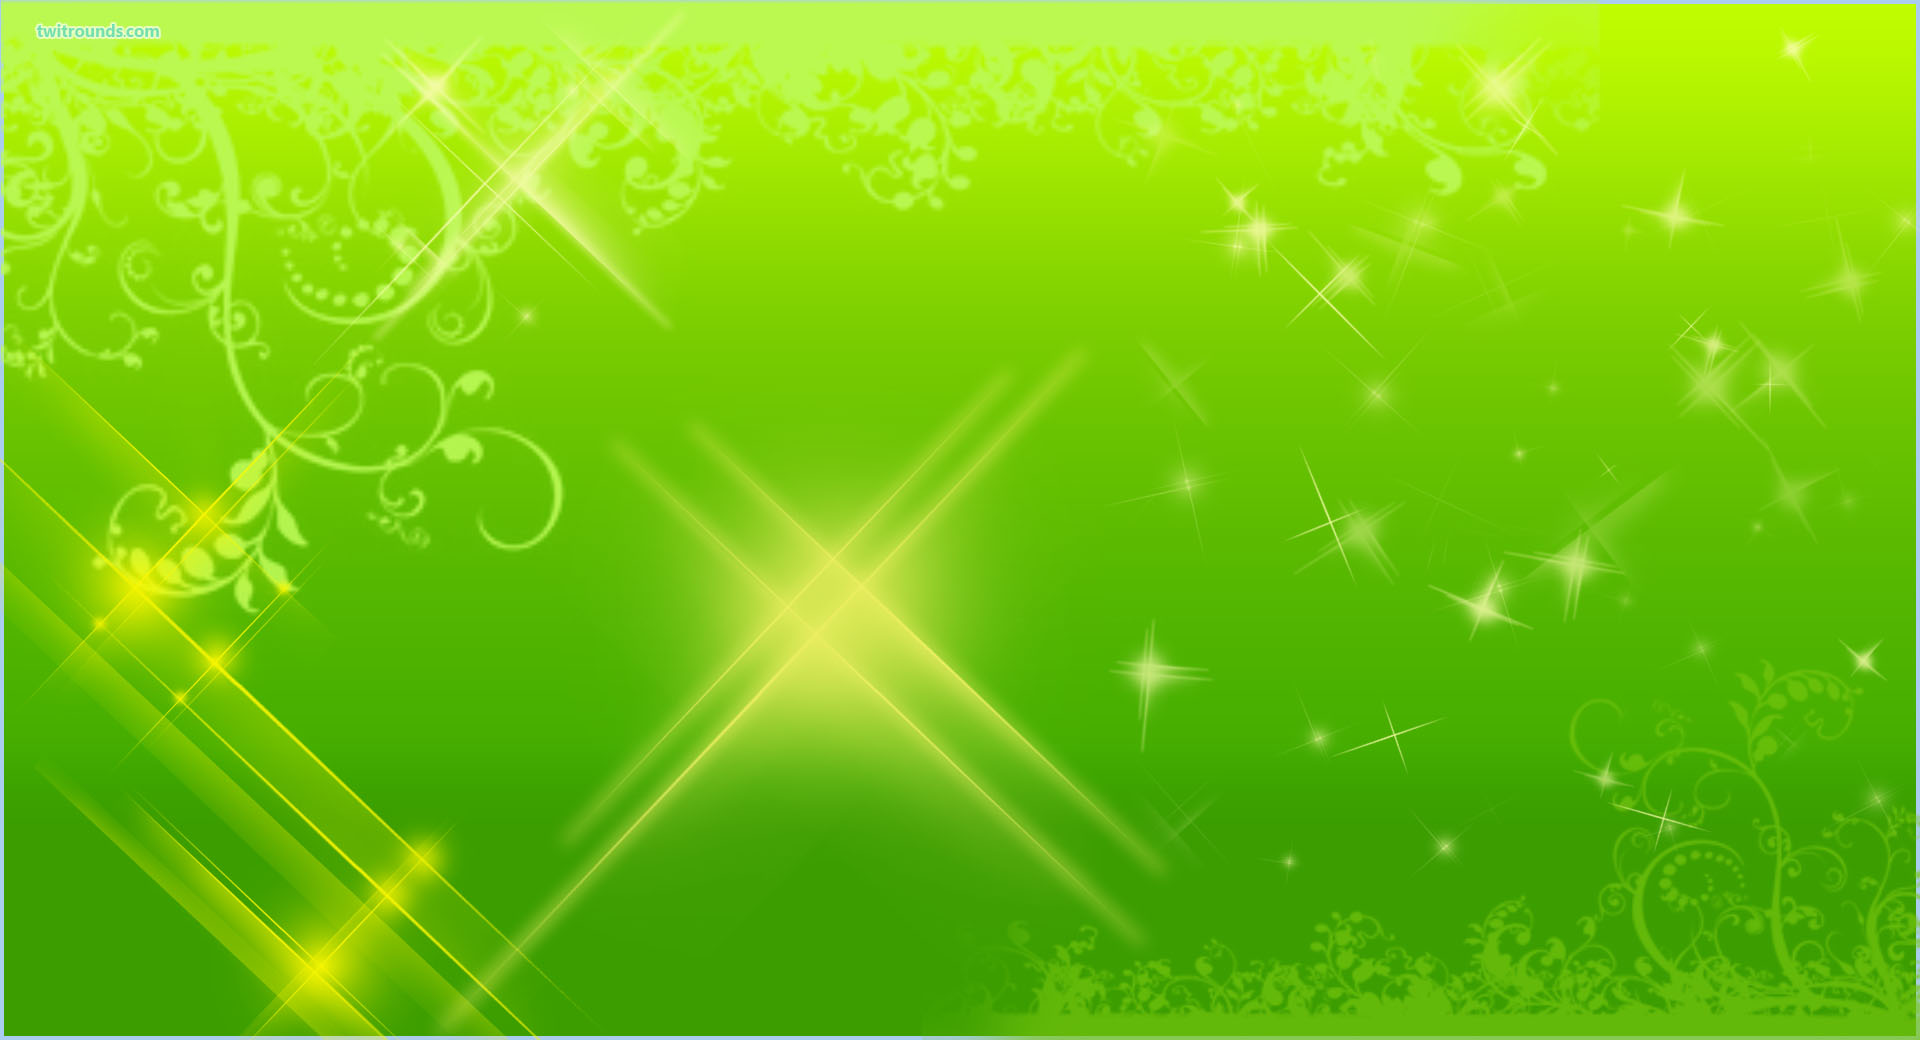 Green Background Wallpaper Sf Wallpaper